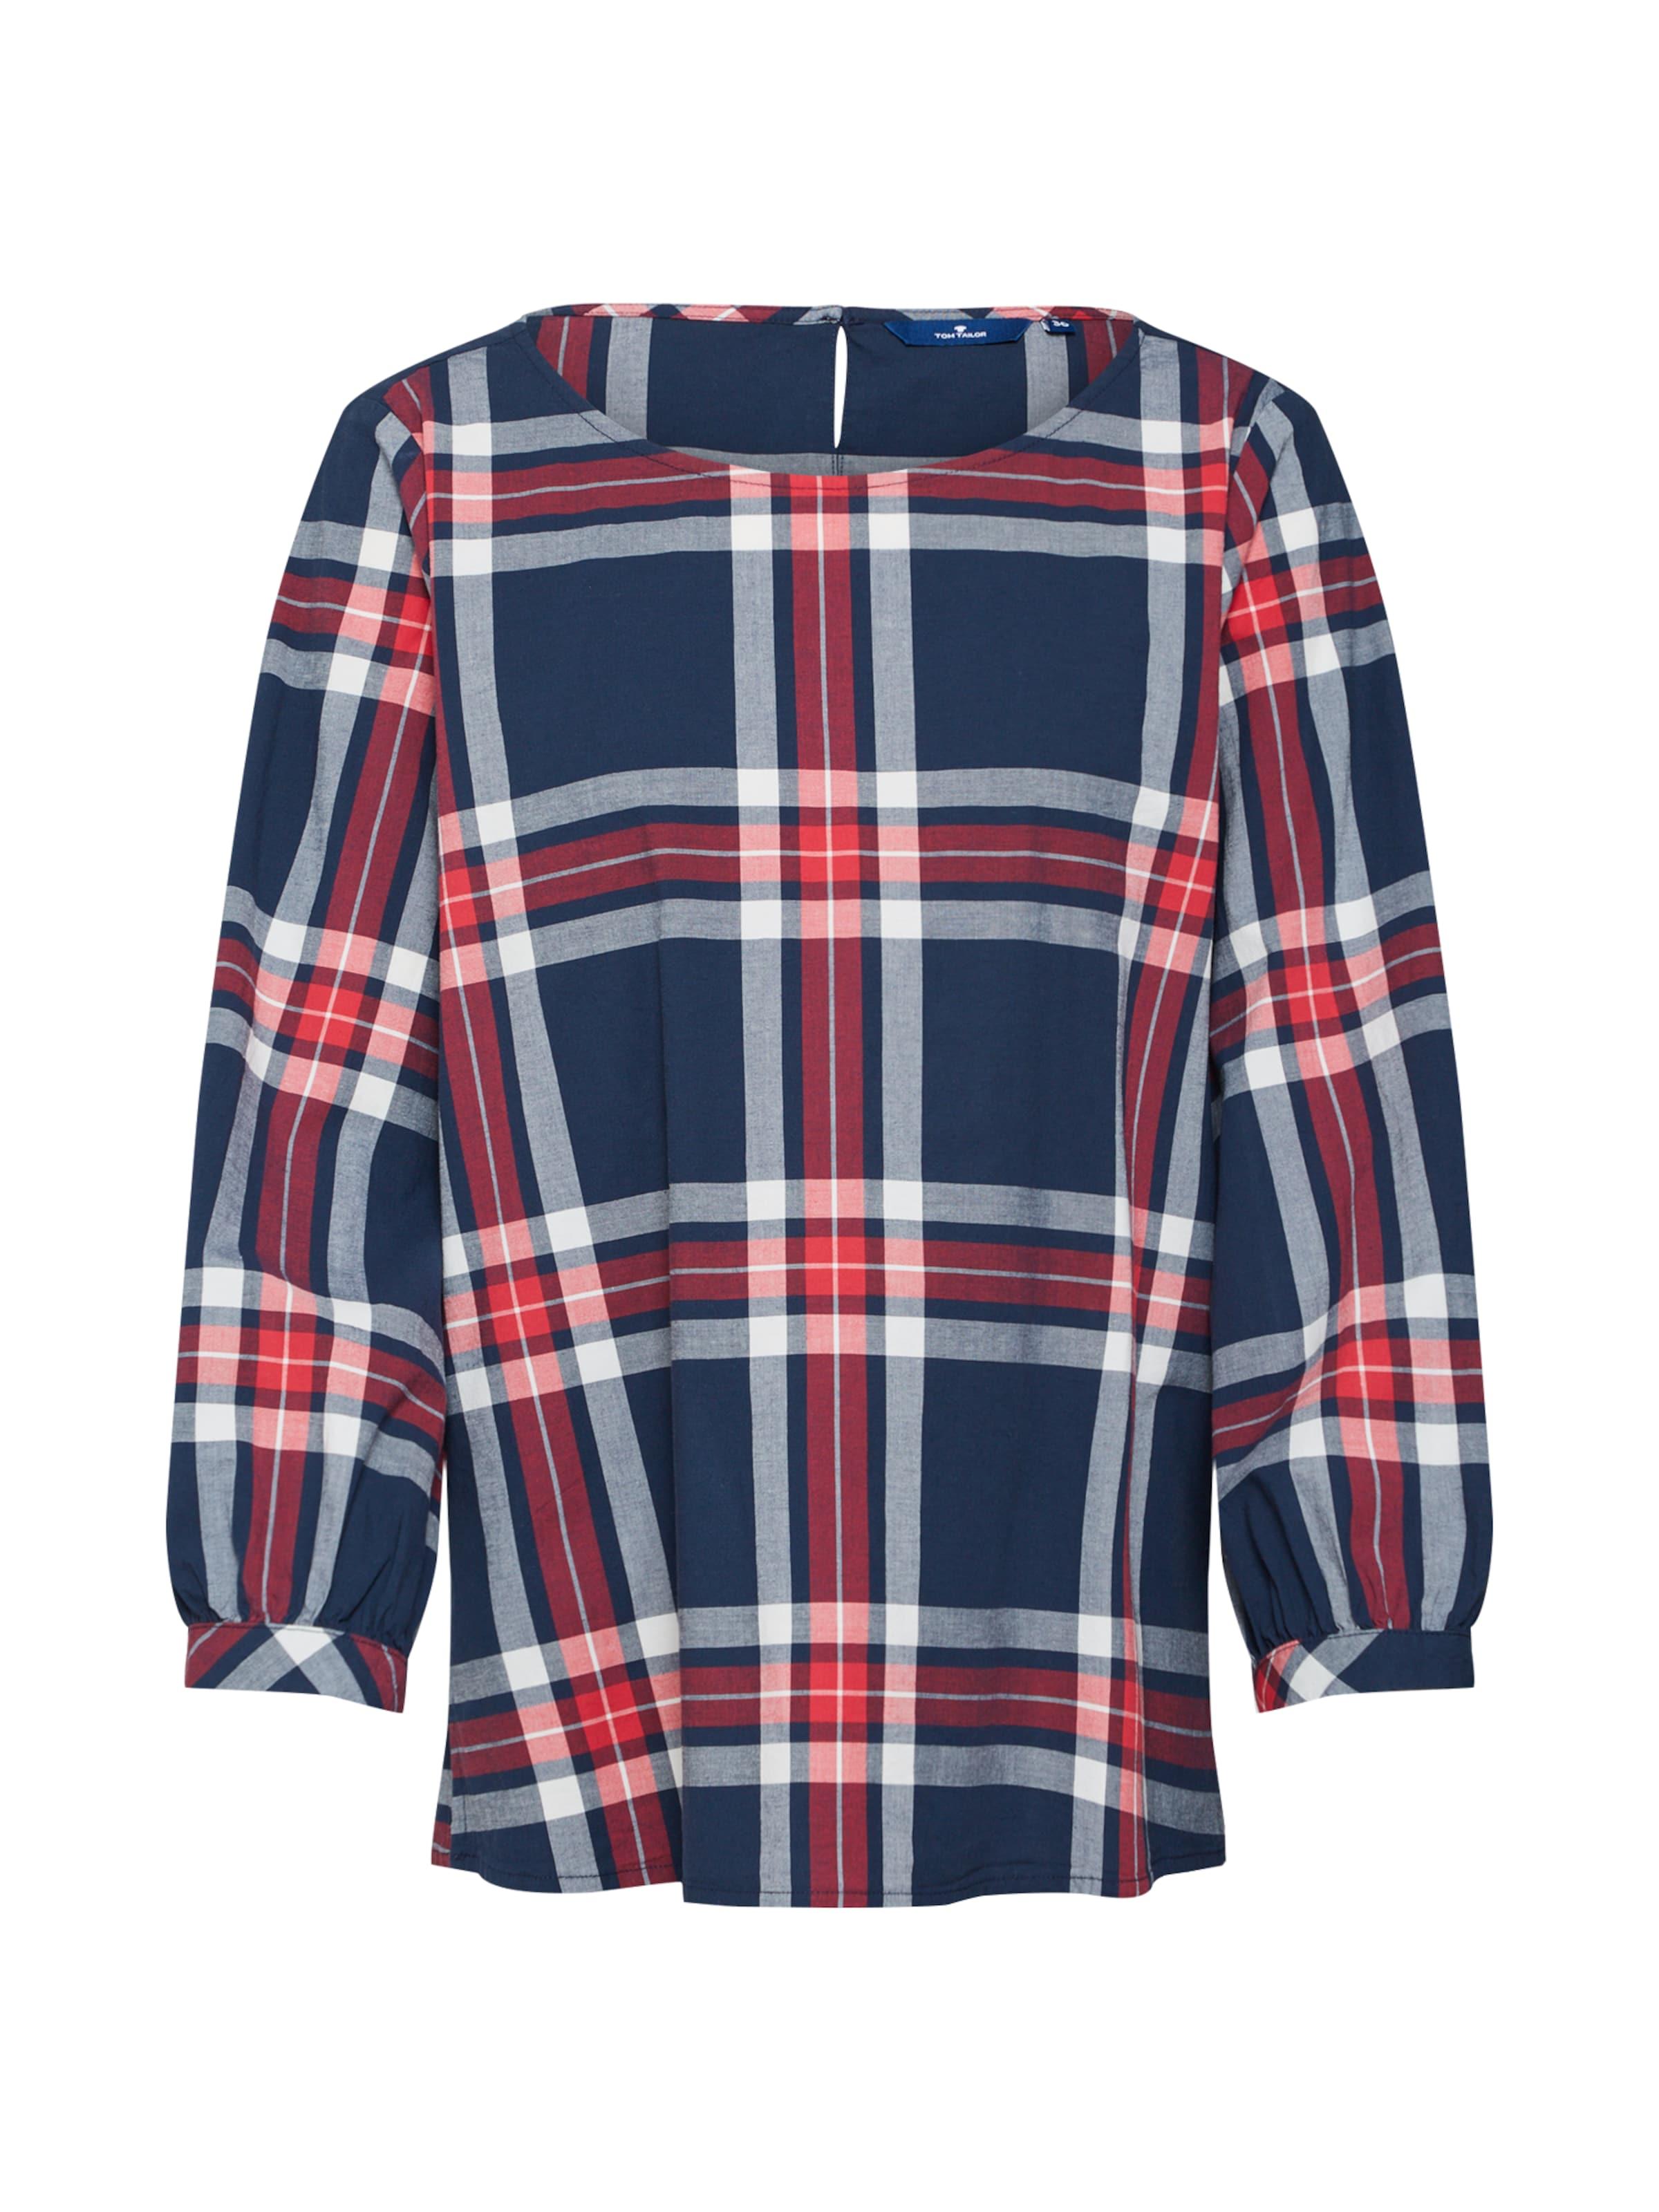 Bluse NavyRot Weiß Tom Tailor In PnOk08wX